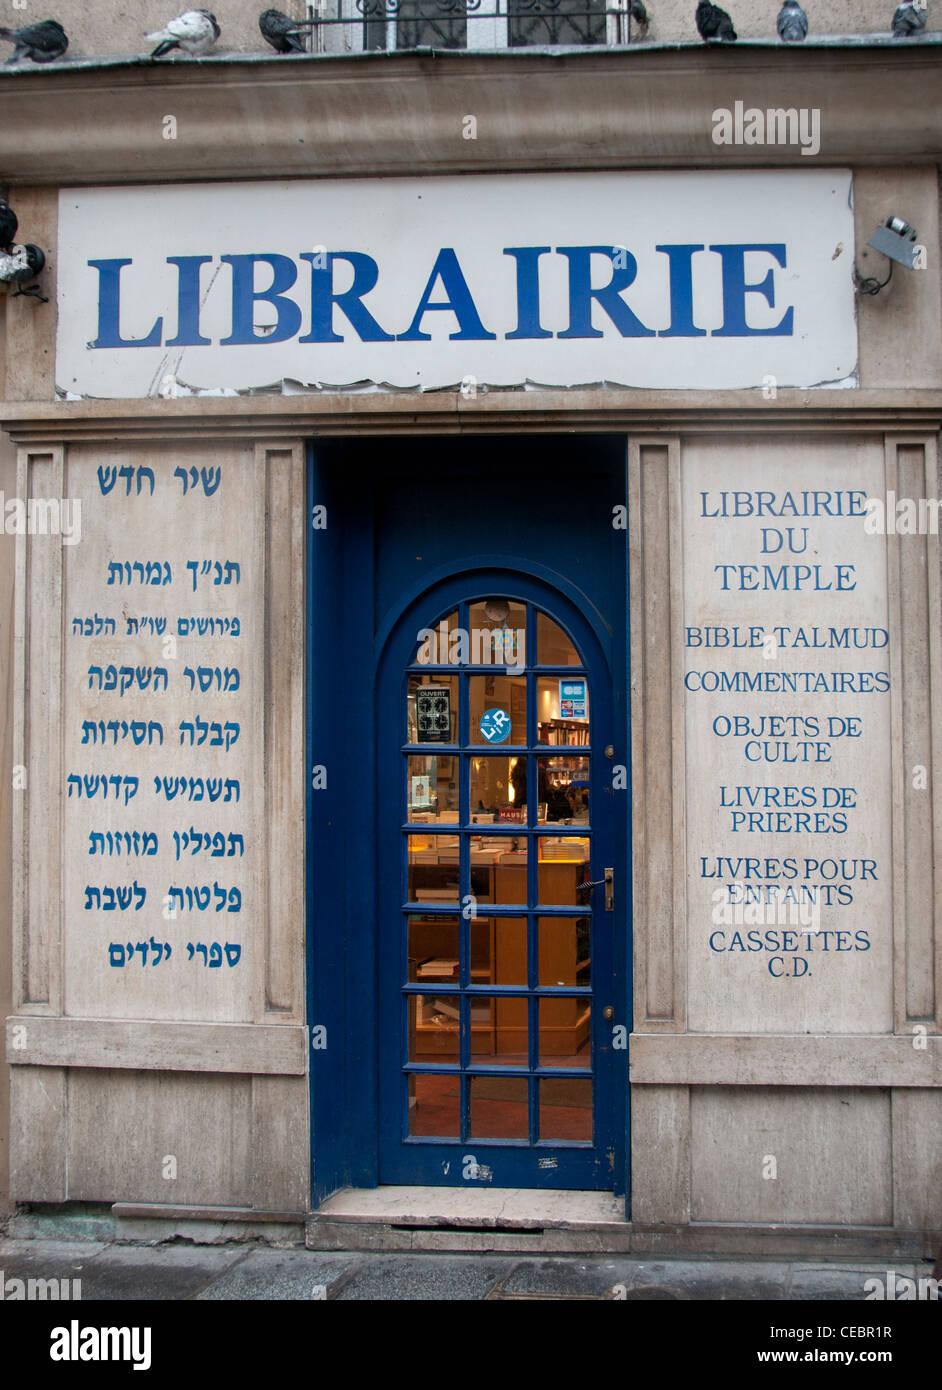 Librairie Du Temple Jew Jewish Library Marais Paris France French - Stock Image